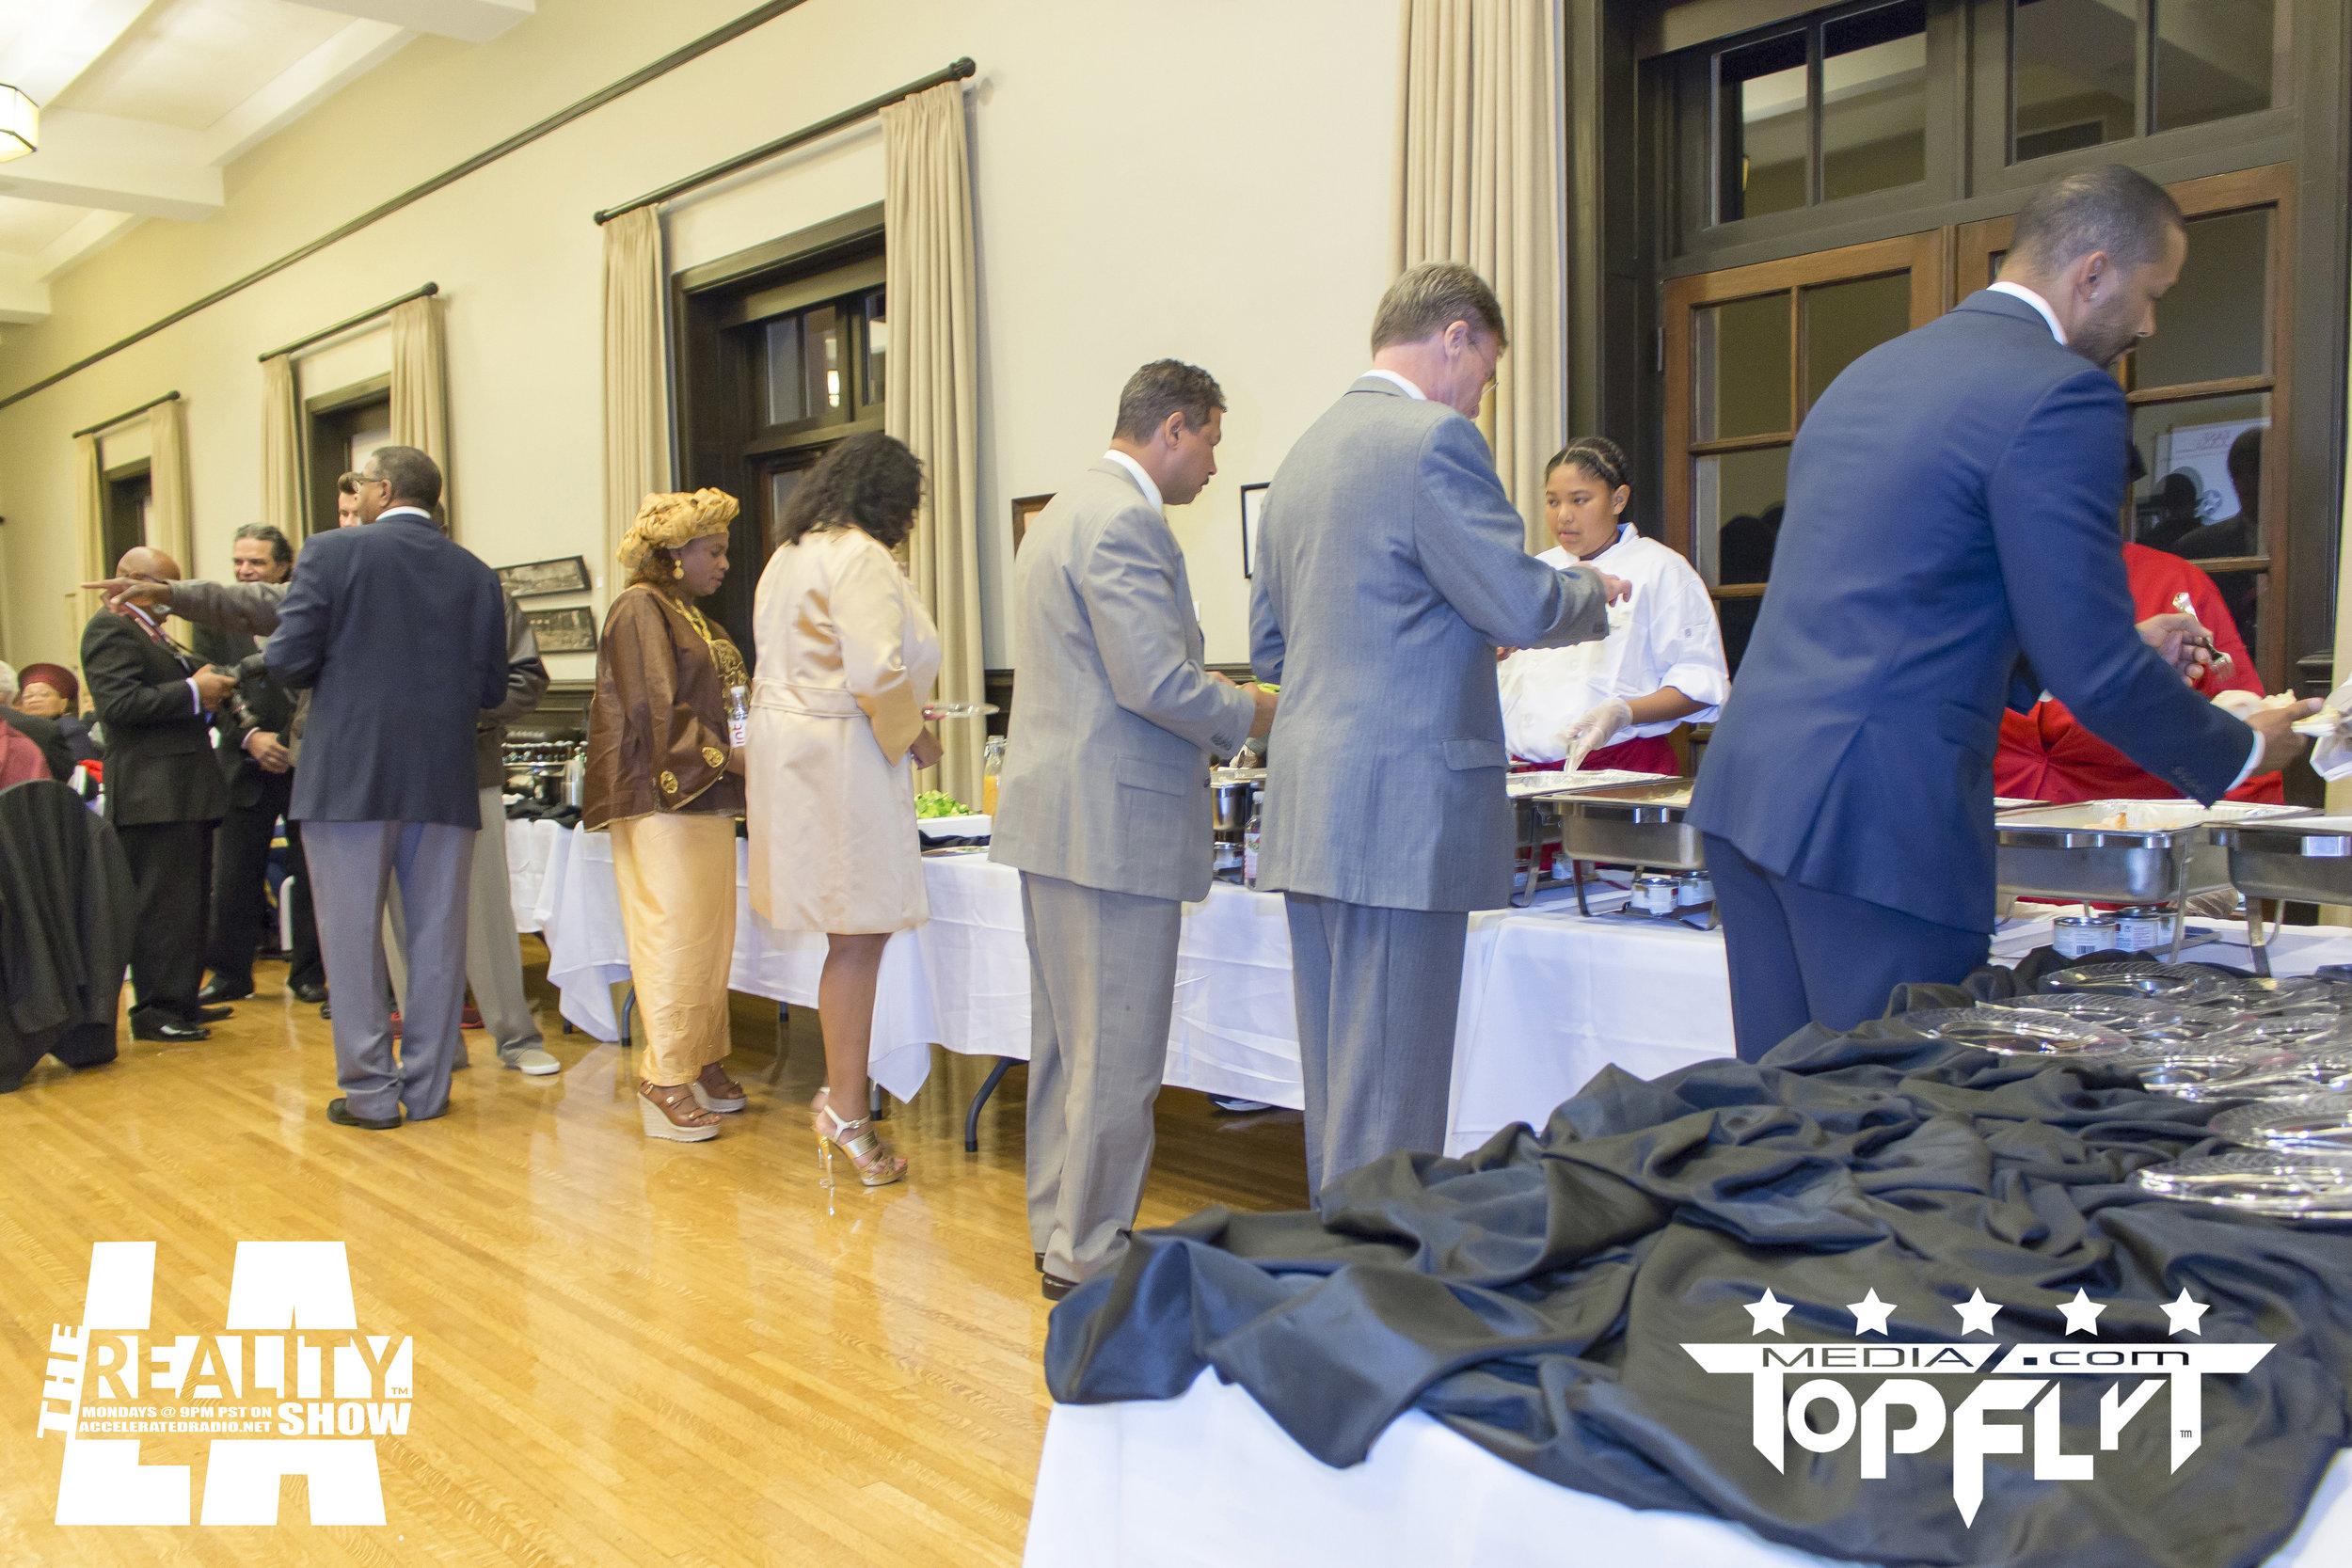 The Reality Show LA - Tuskegee Airmen 75th Anniversary VIP Reception_103.jpg